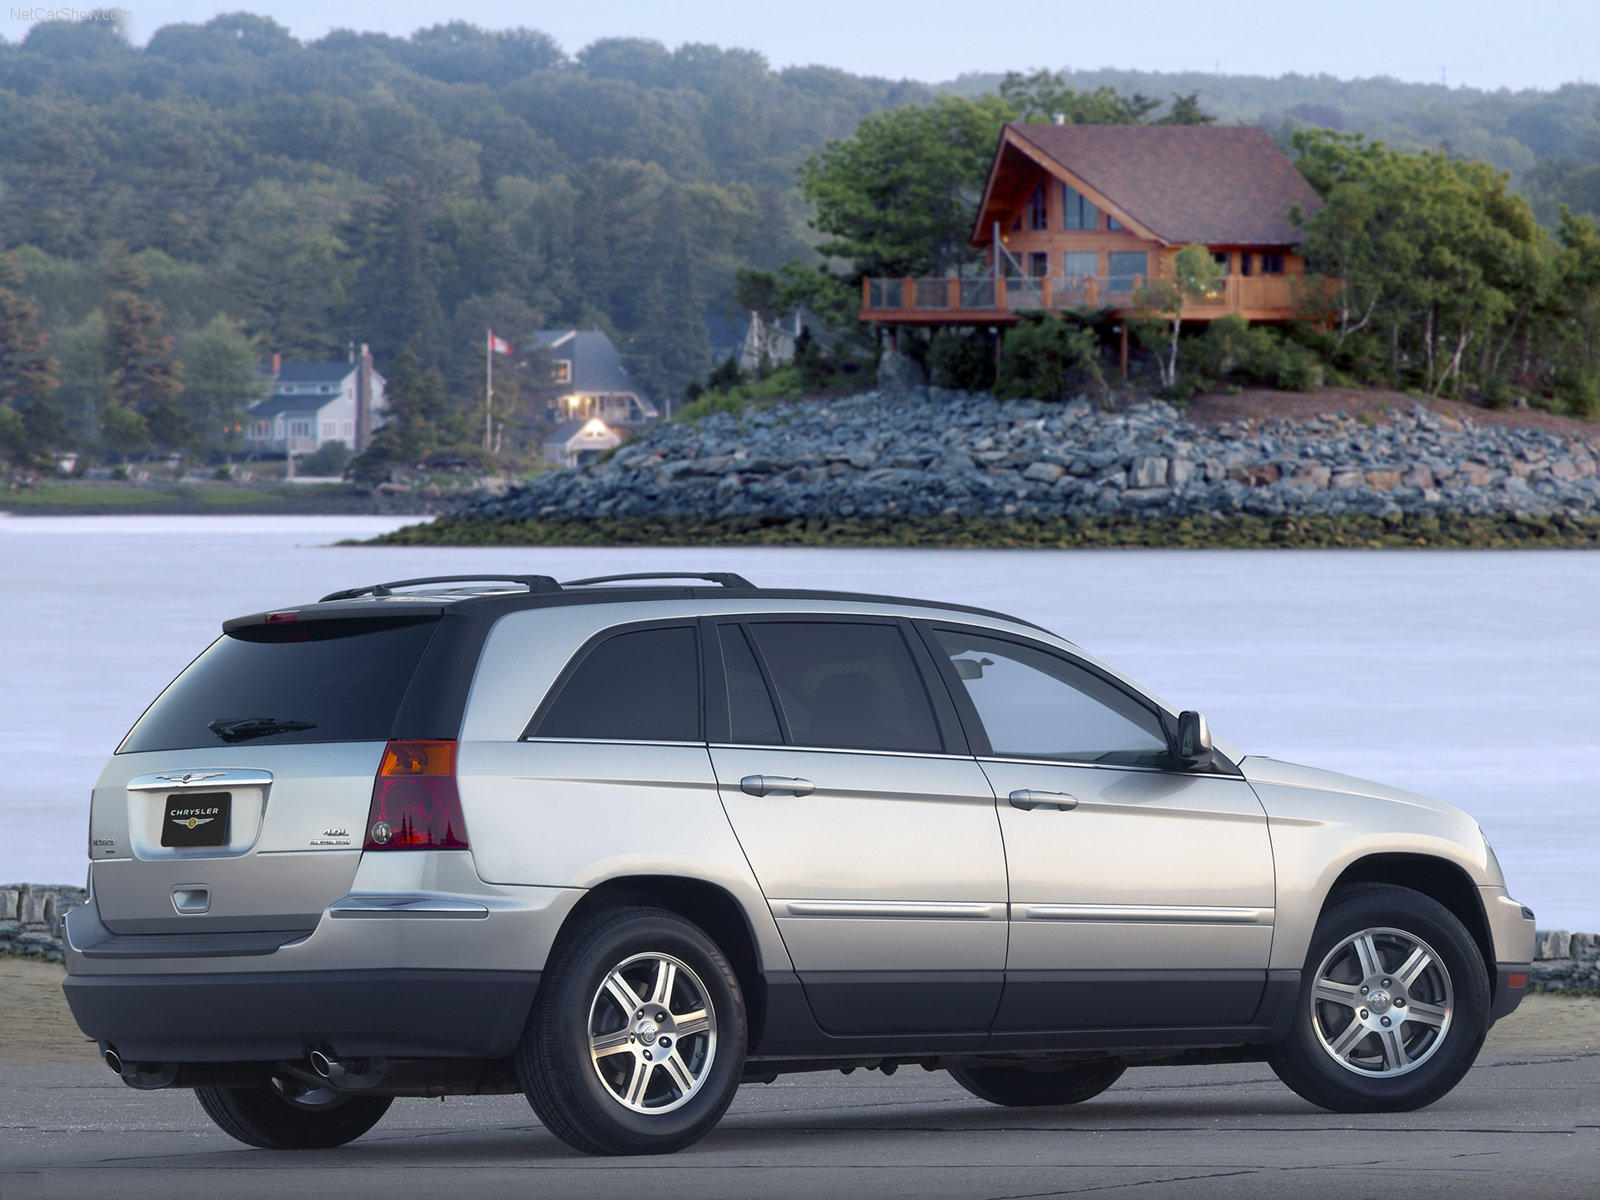 Chrysler Pacifica  3.5 i V6 24V FWD 253 KM Suv